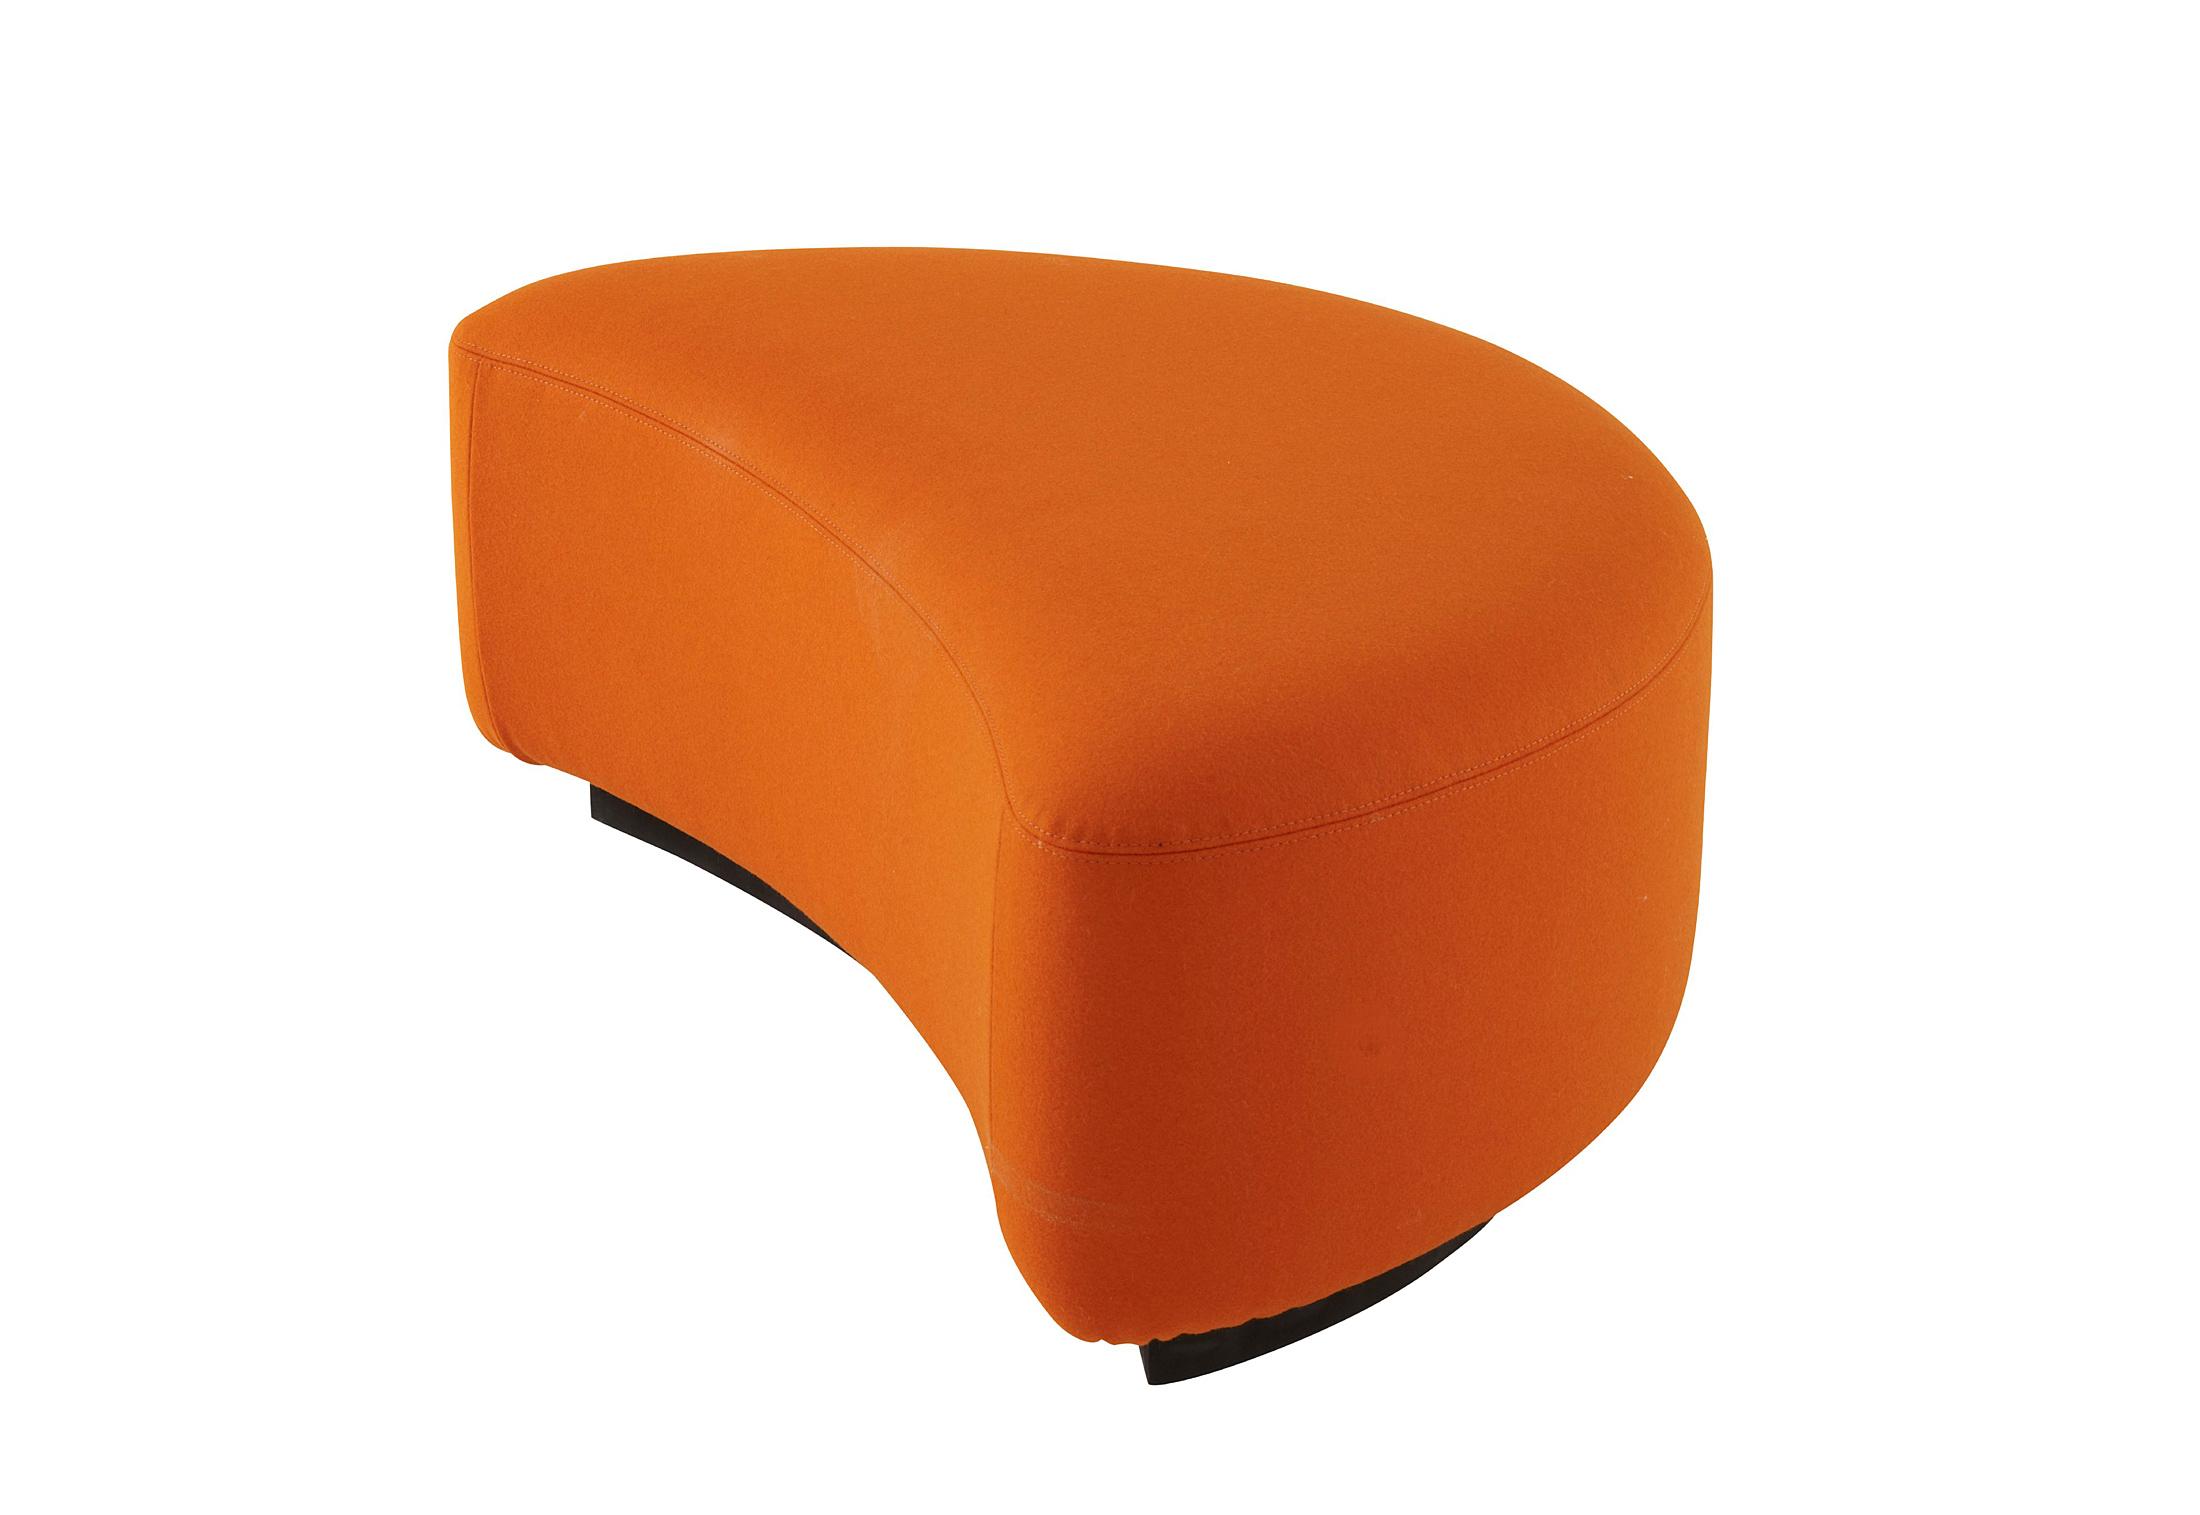 lys e pouf by ligne roset stylepark. Black Bedroom Furniture Sets. Home Design Ideas